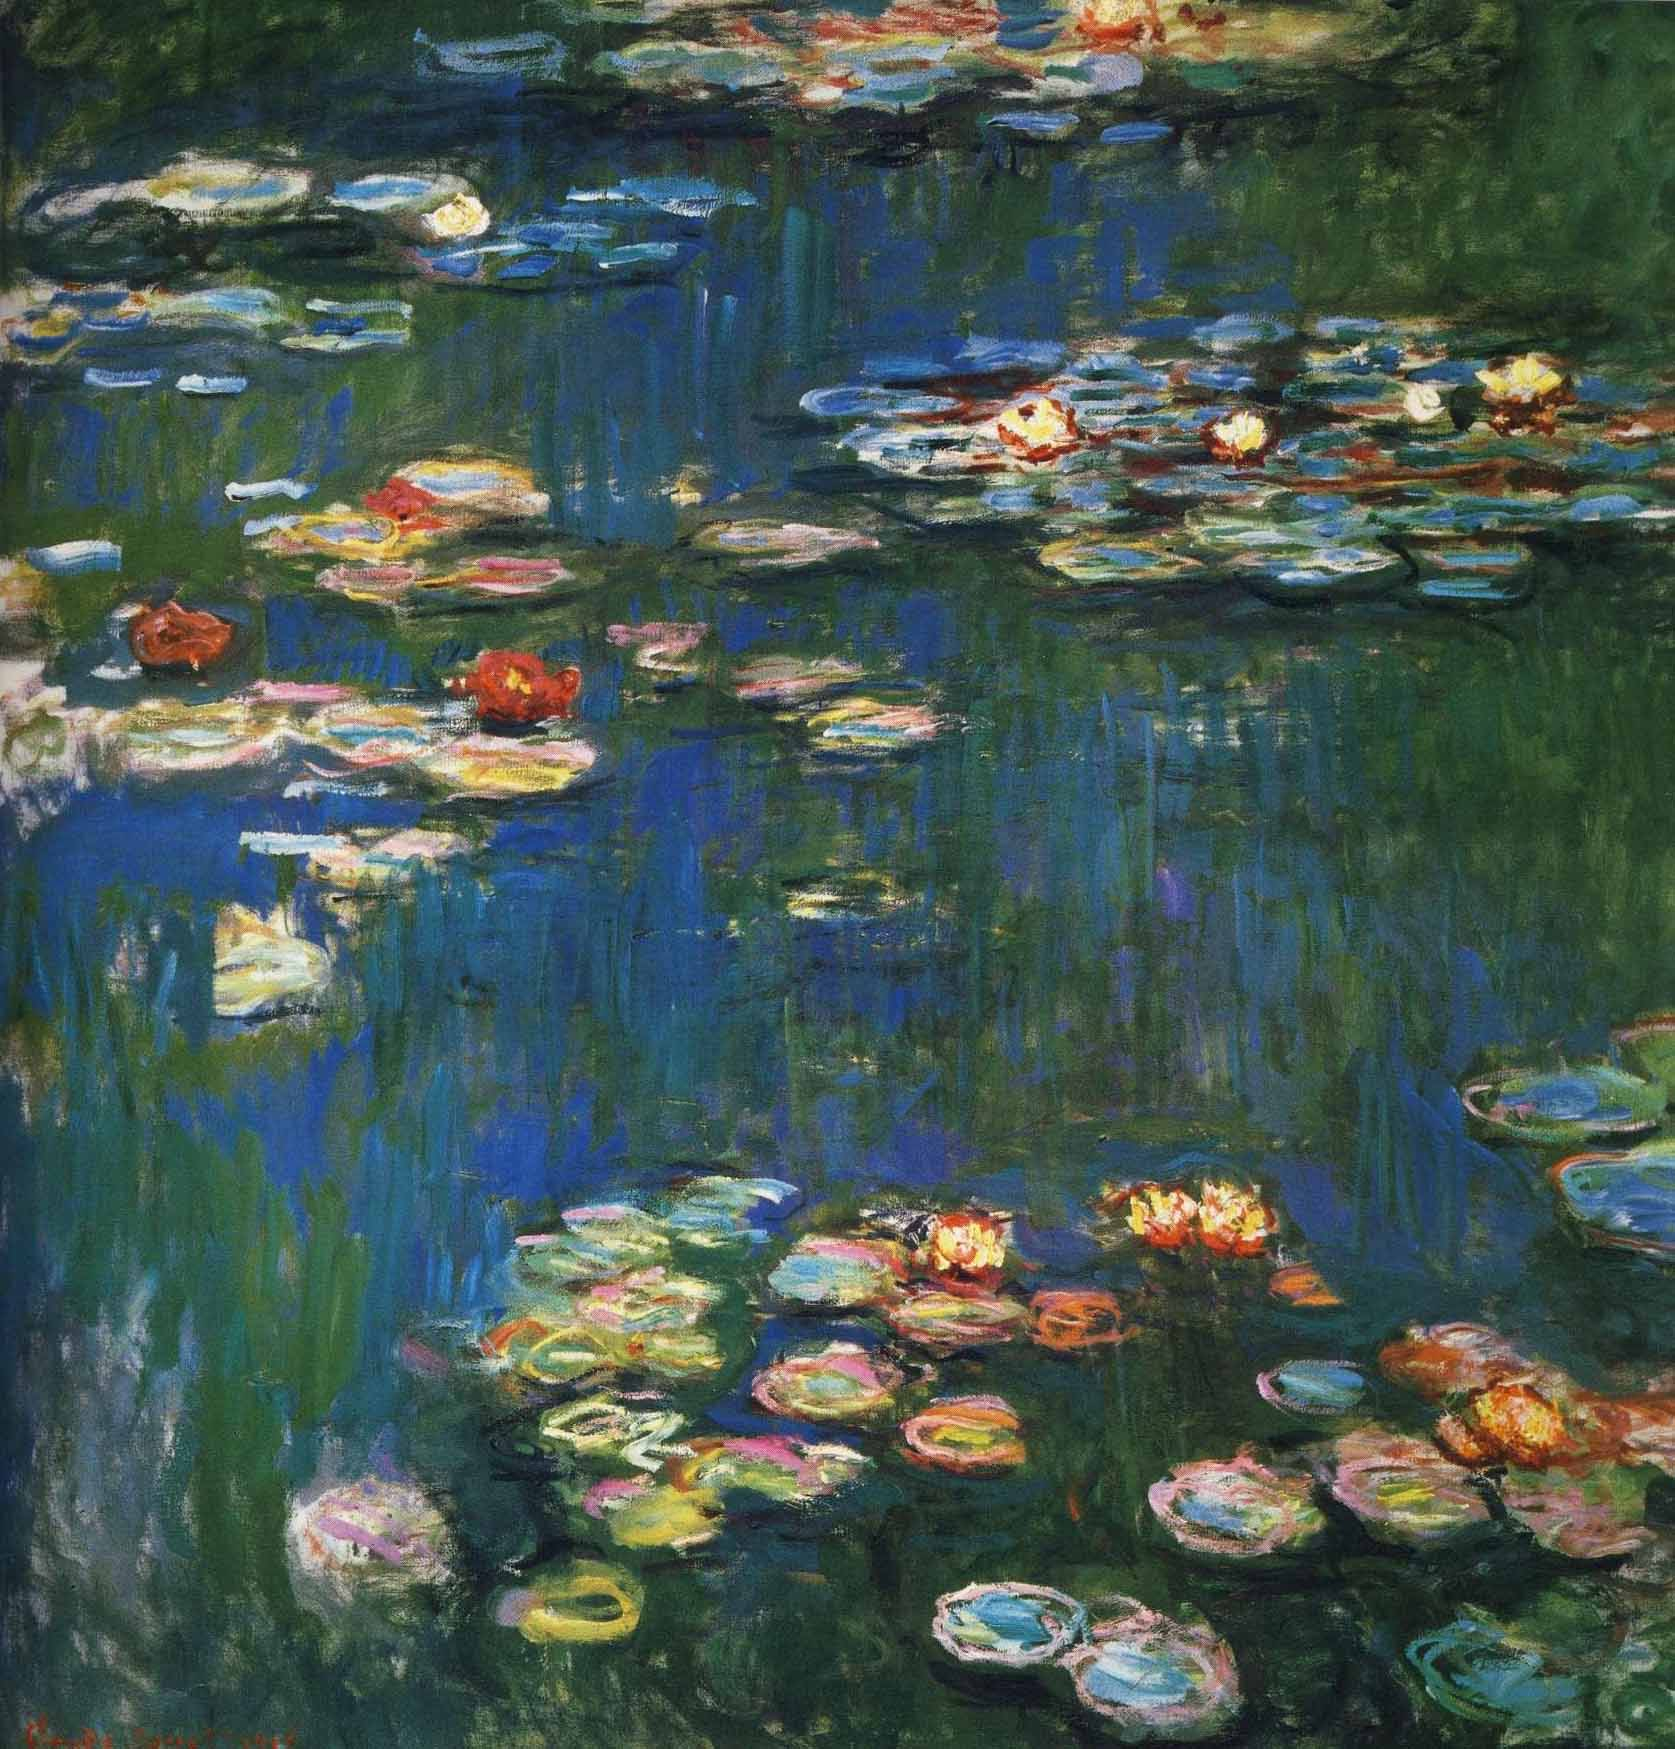 Клод Моне, 1914-1917 годы, картина «Кувшинки».